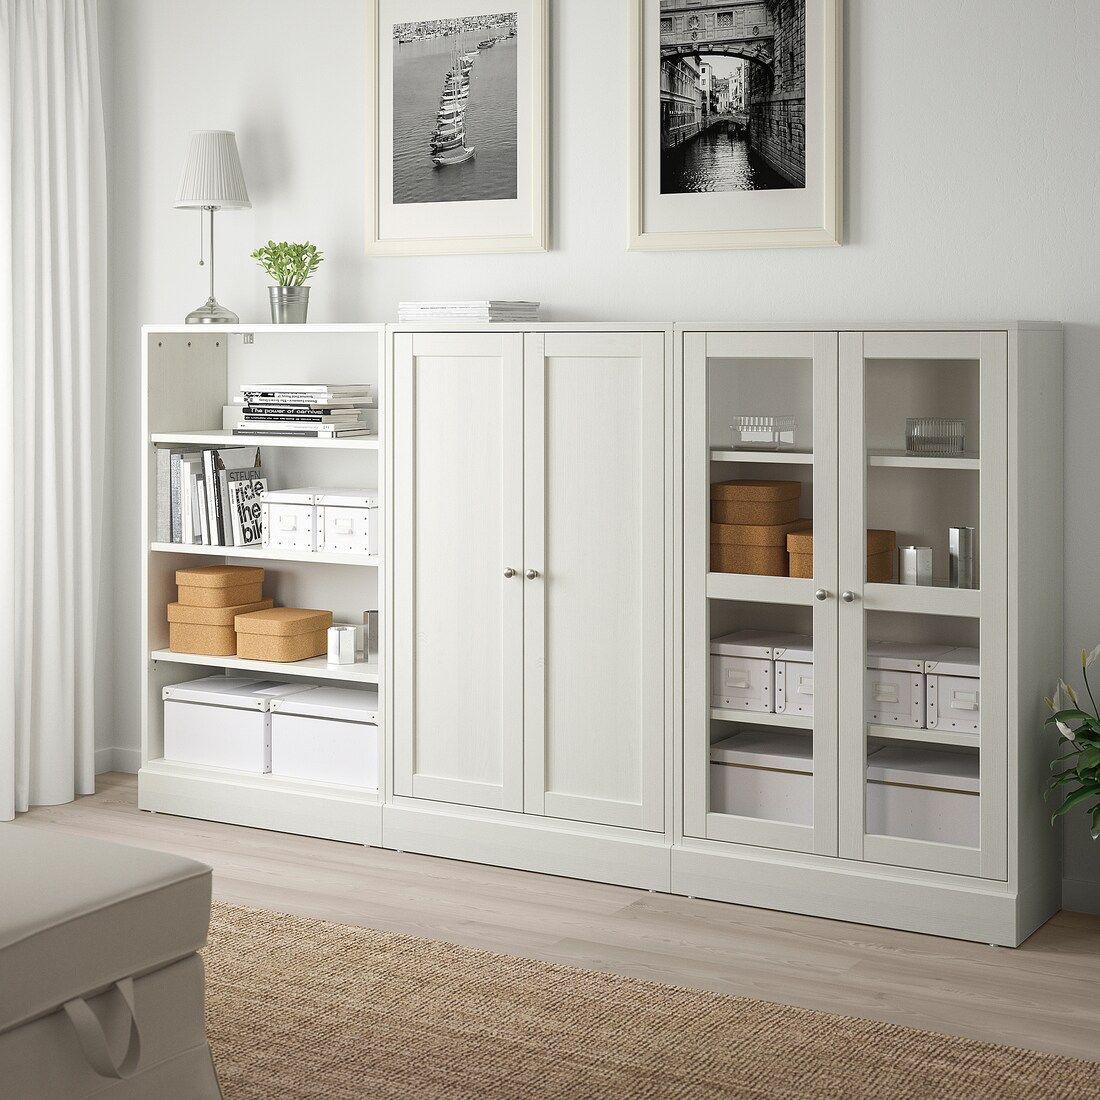 HAVSTA Storage combination w/glass doors white IKEA in